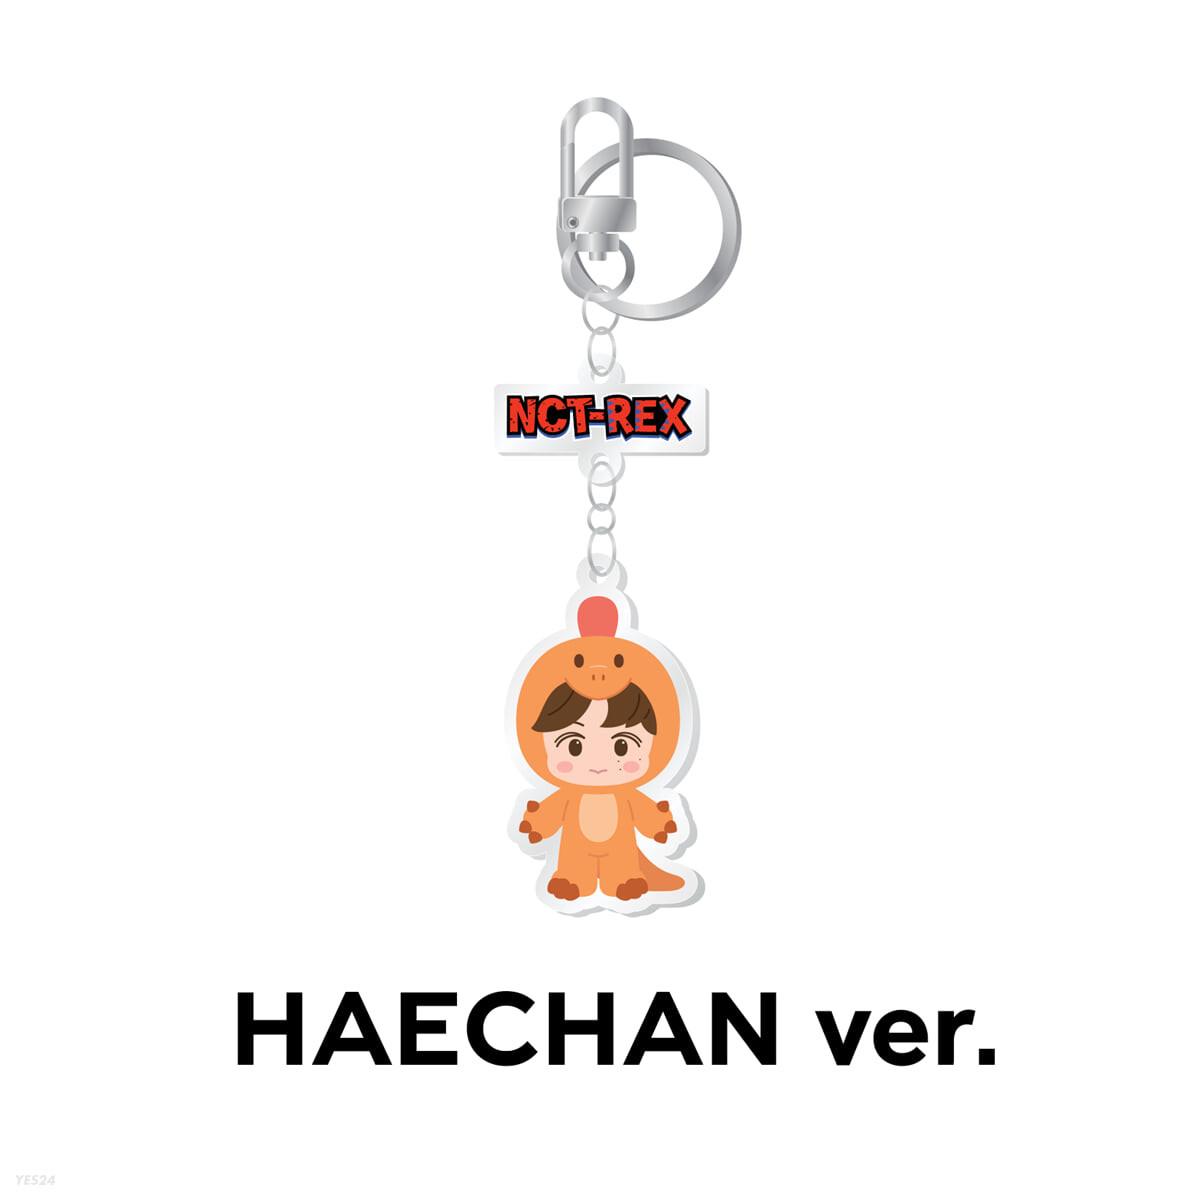 [HAECHAN] ACRYLIC KEY RING - NCT DREAM X PINKFONG